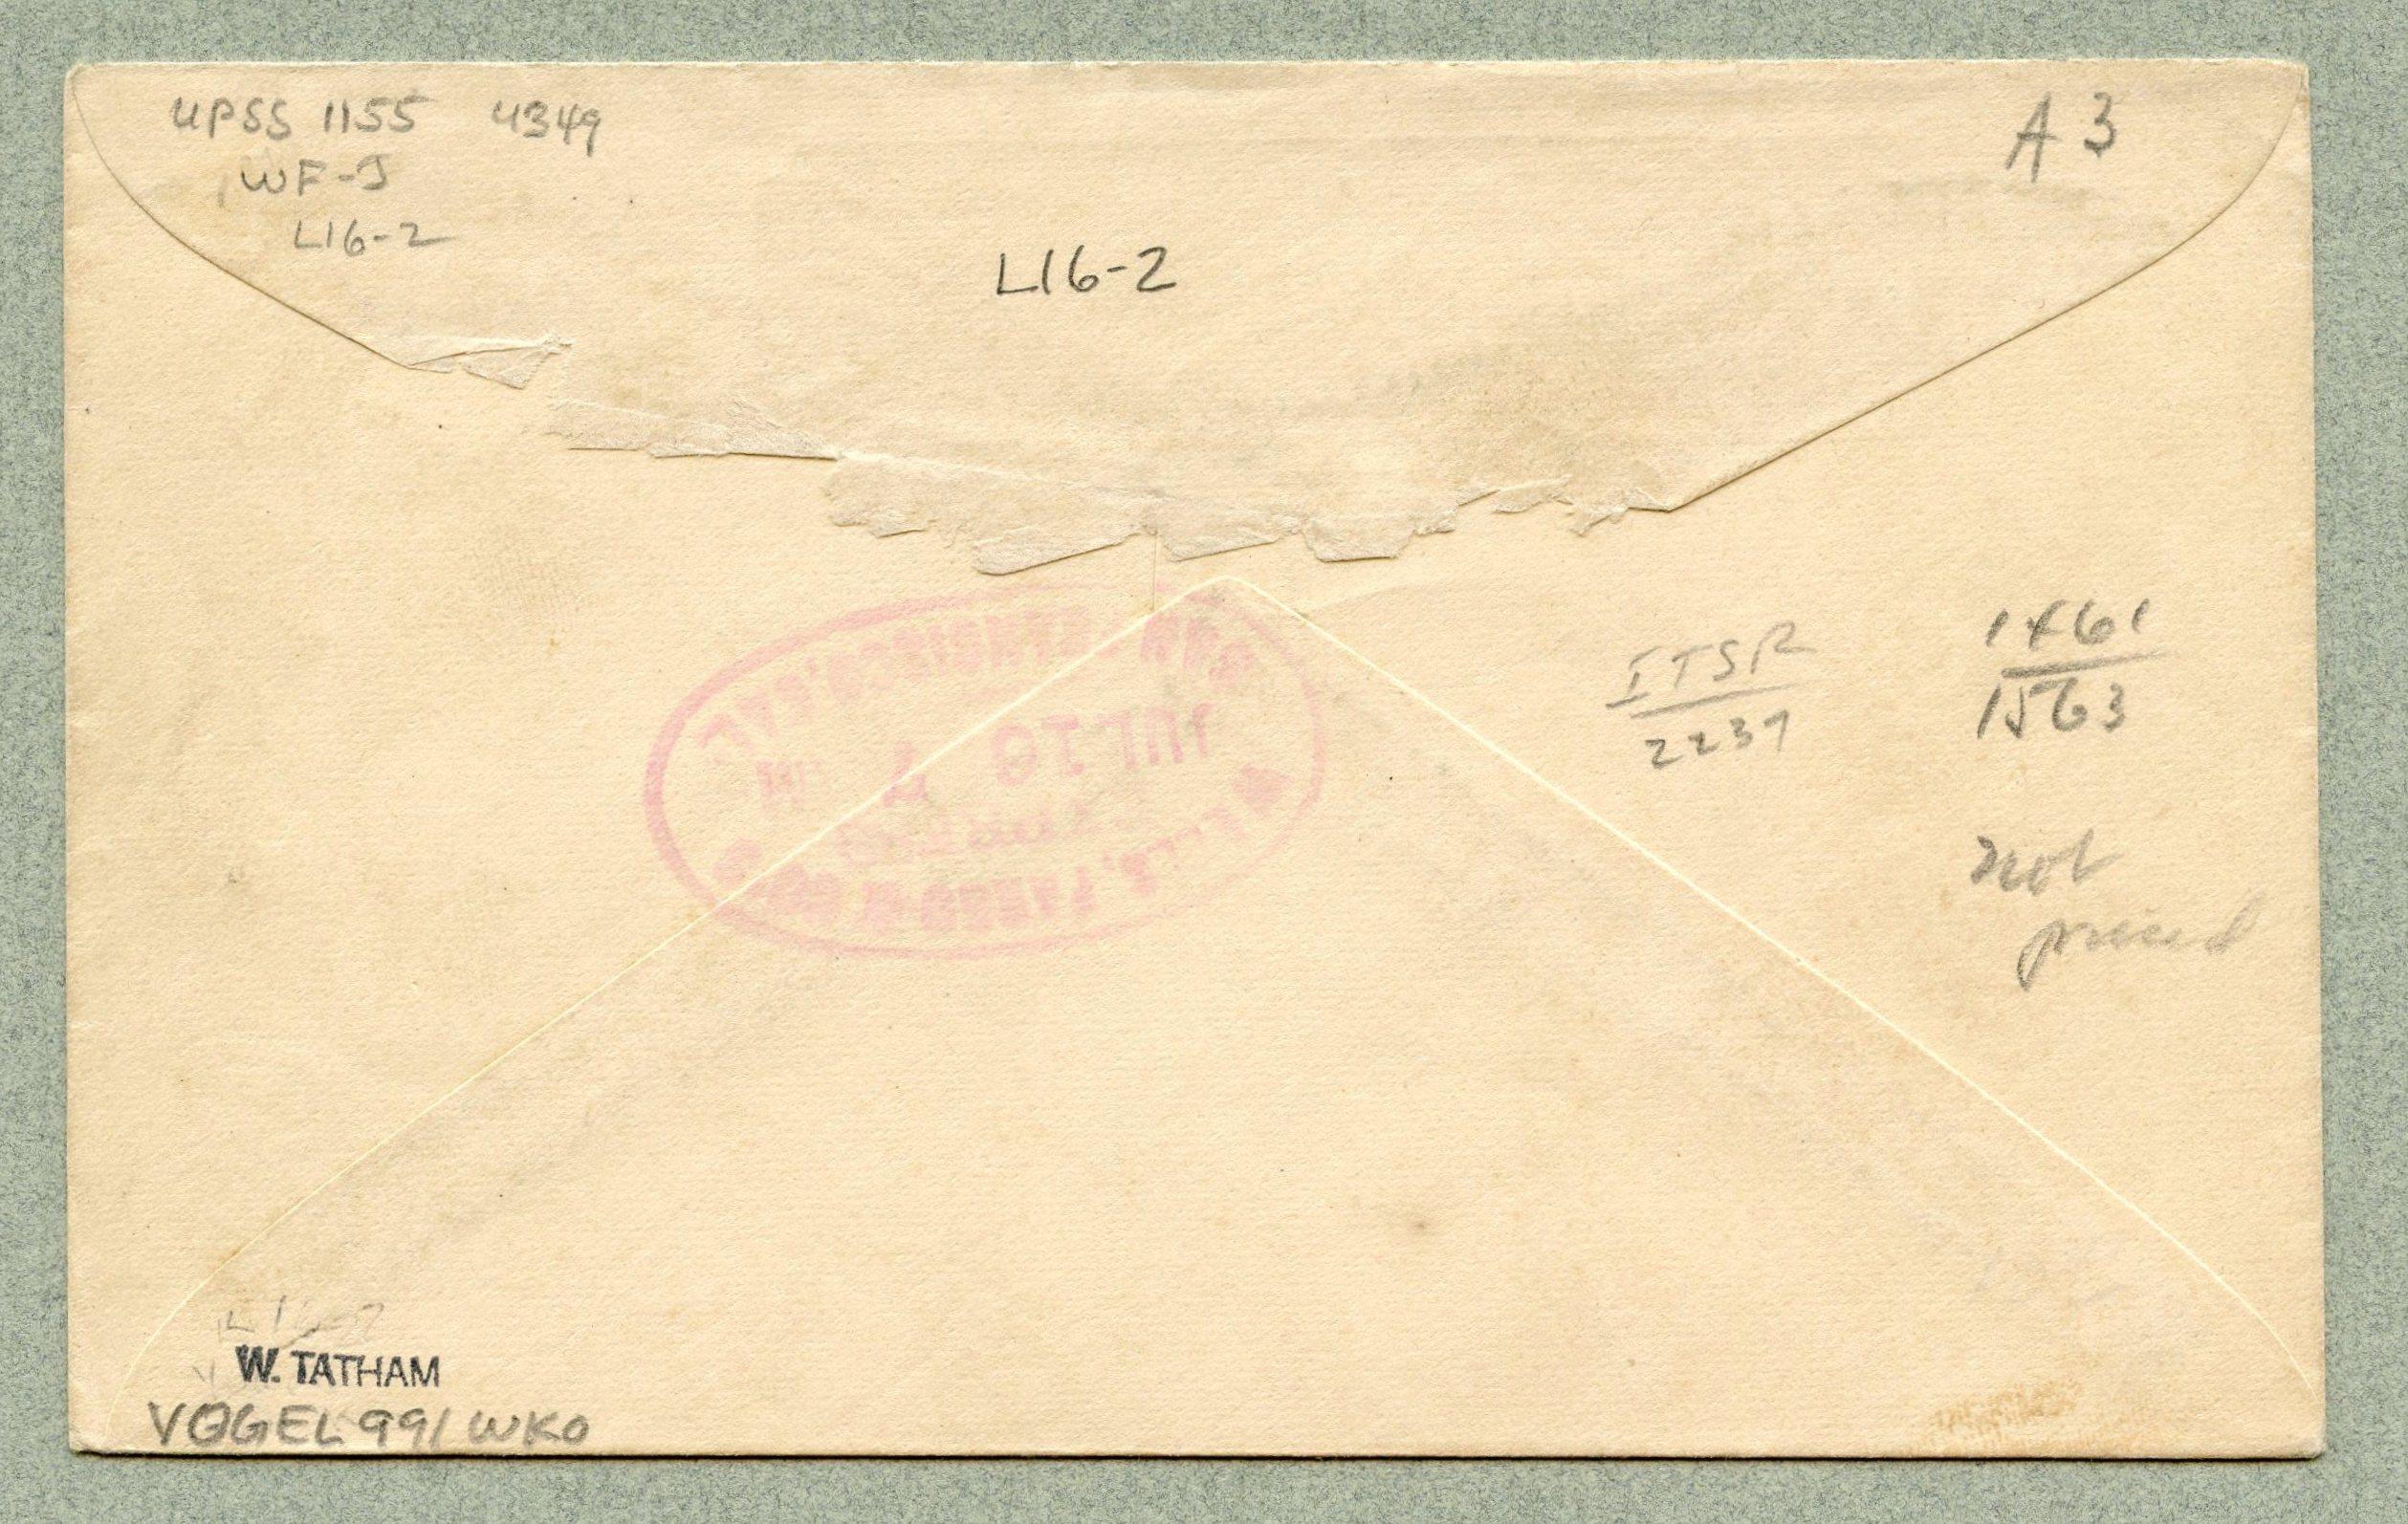 RR Strike 1894 Jul 10a